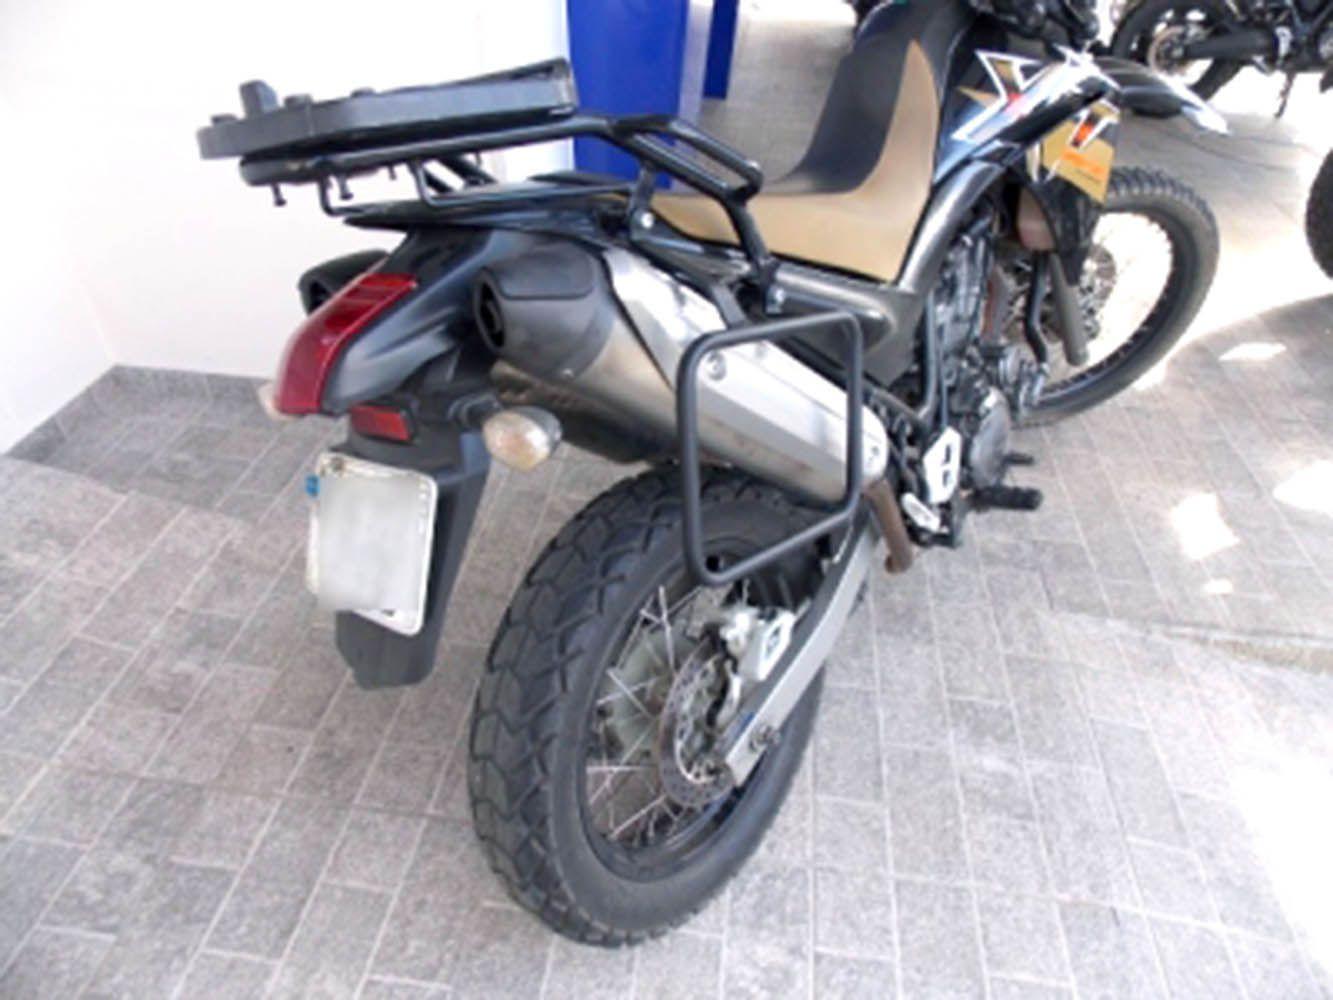 Afastador Alforge Yamaha Xt 660 R Preto Fosco Chapam 10731